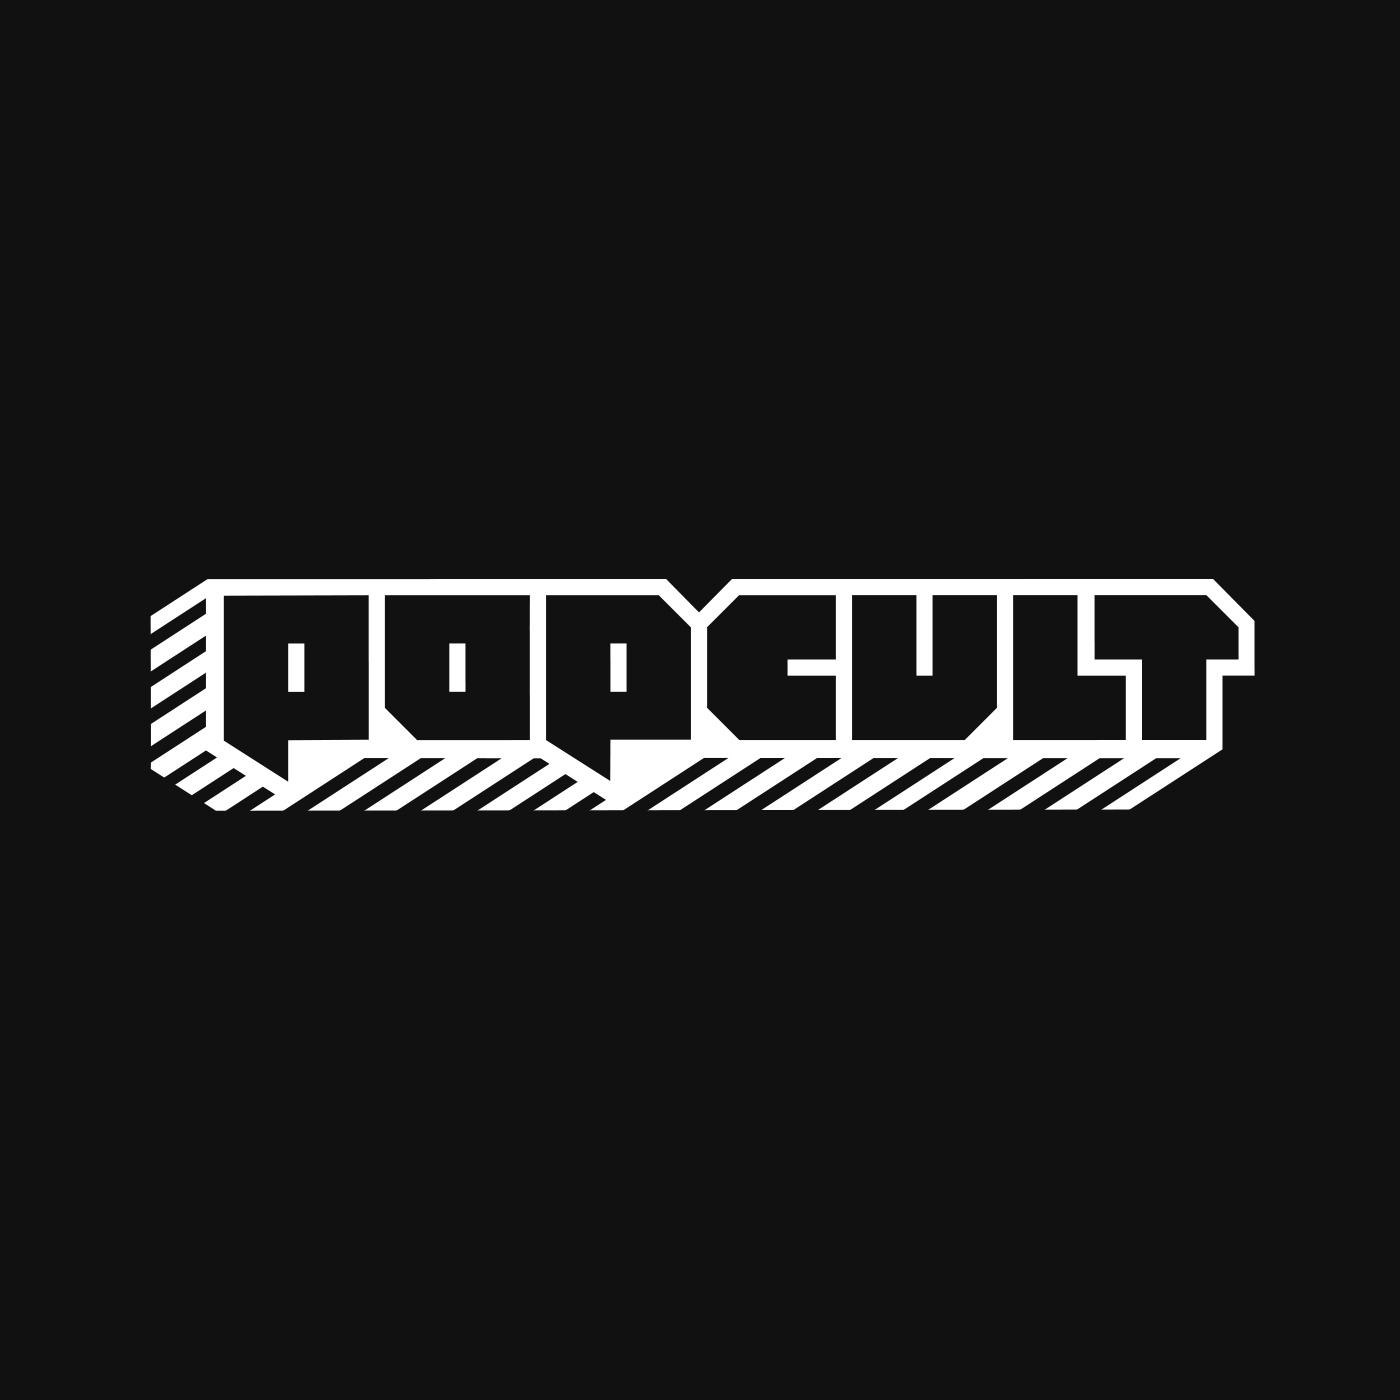 Popcult_04